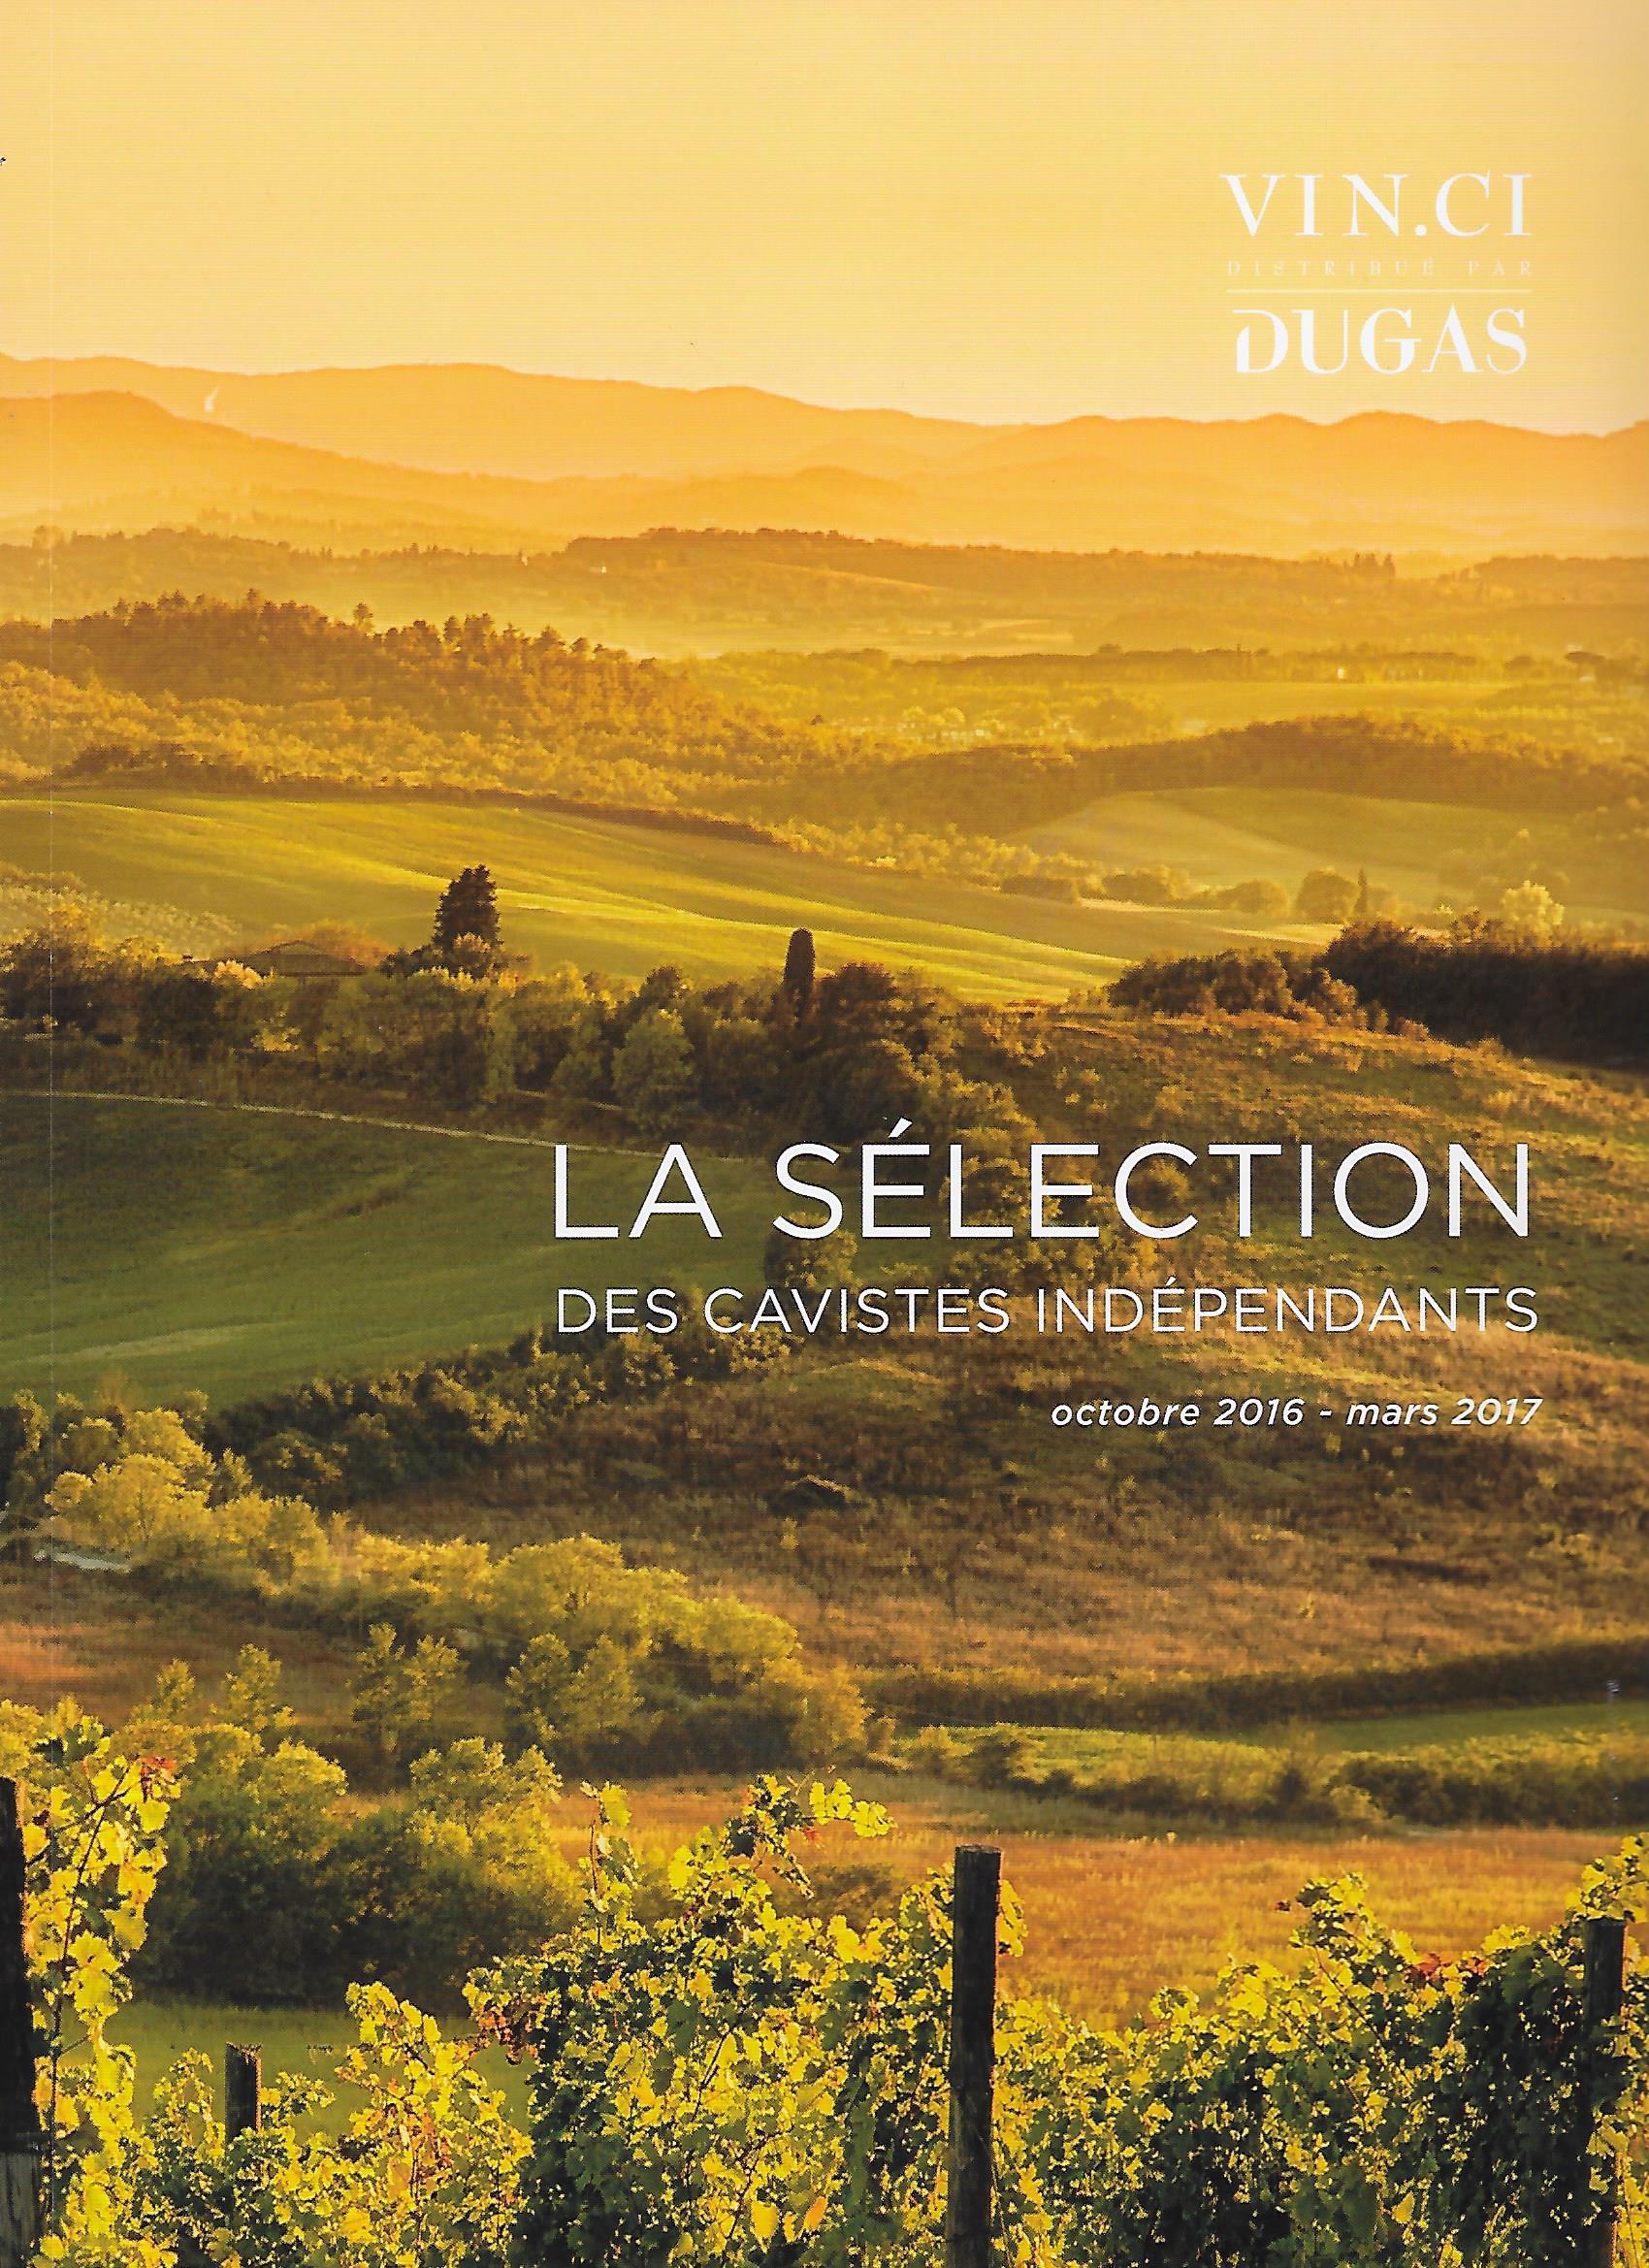 Le Catalogue Vinci des cavistes